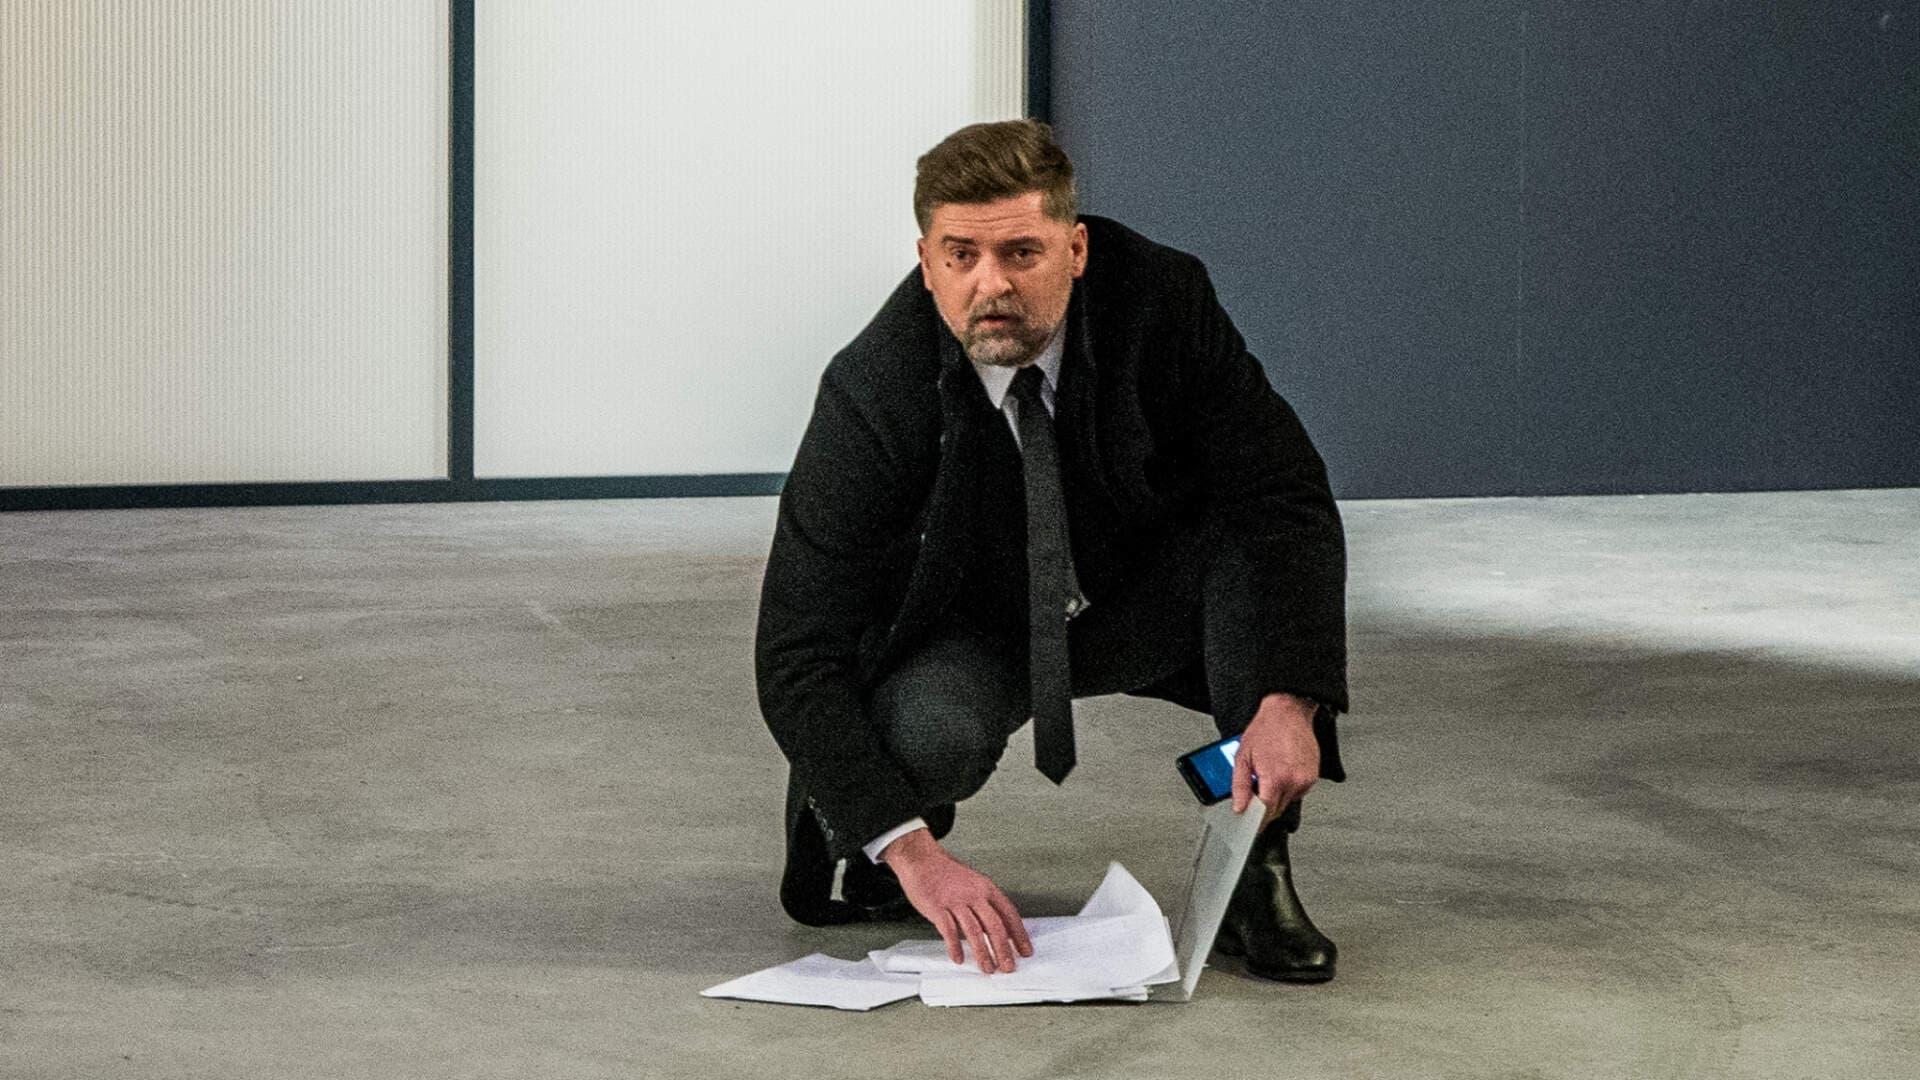 Zakochani po uszy - Season 5 Episode 56 : Episode 56